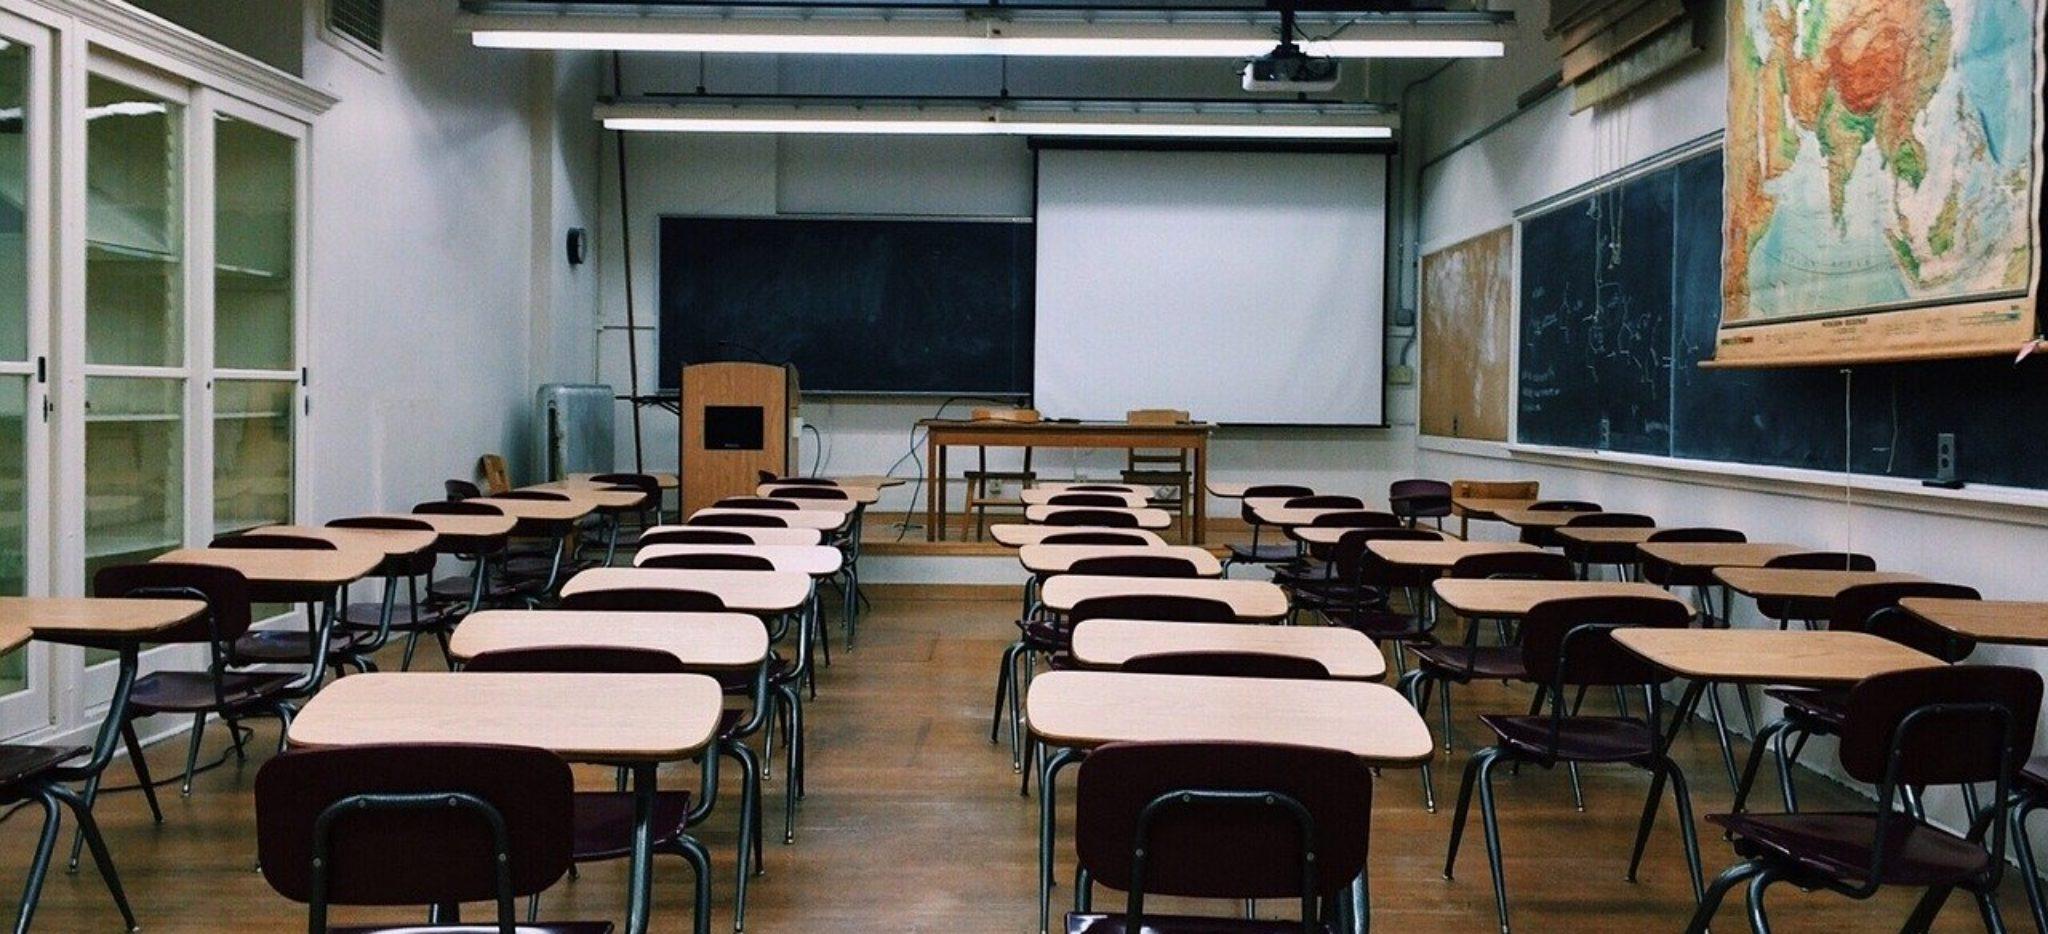 private high schools in Spain